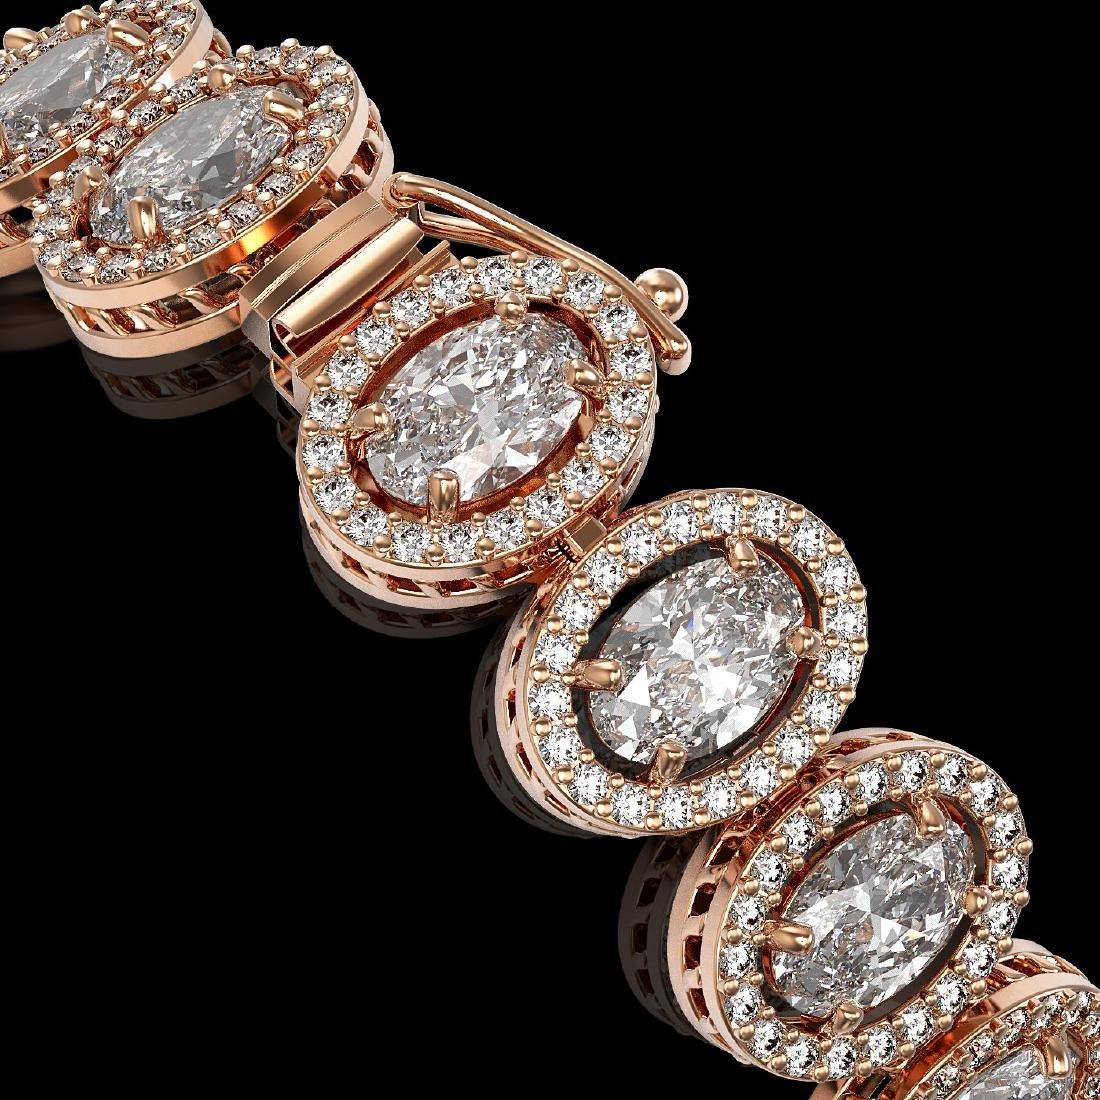 15.8 CTW Oval Diamond Designer Bracelet 18K Rose Gold - 3